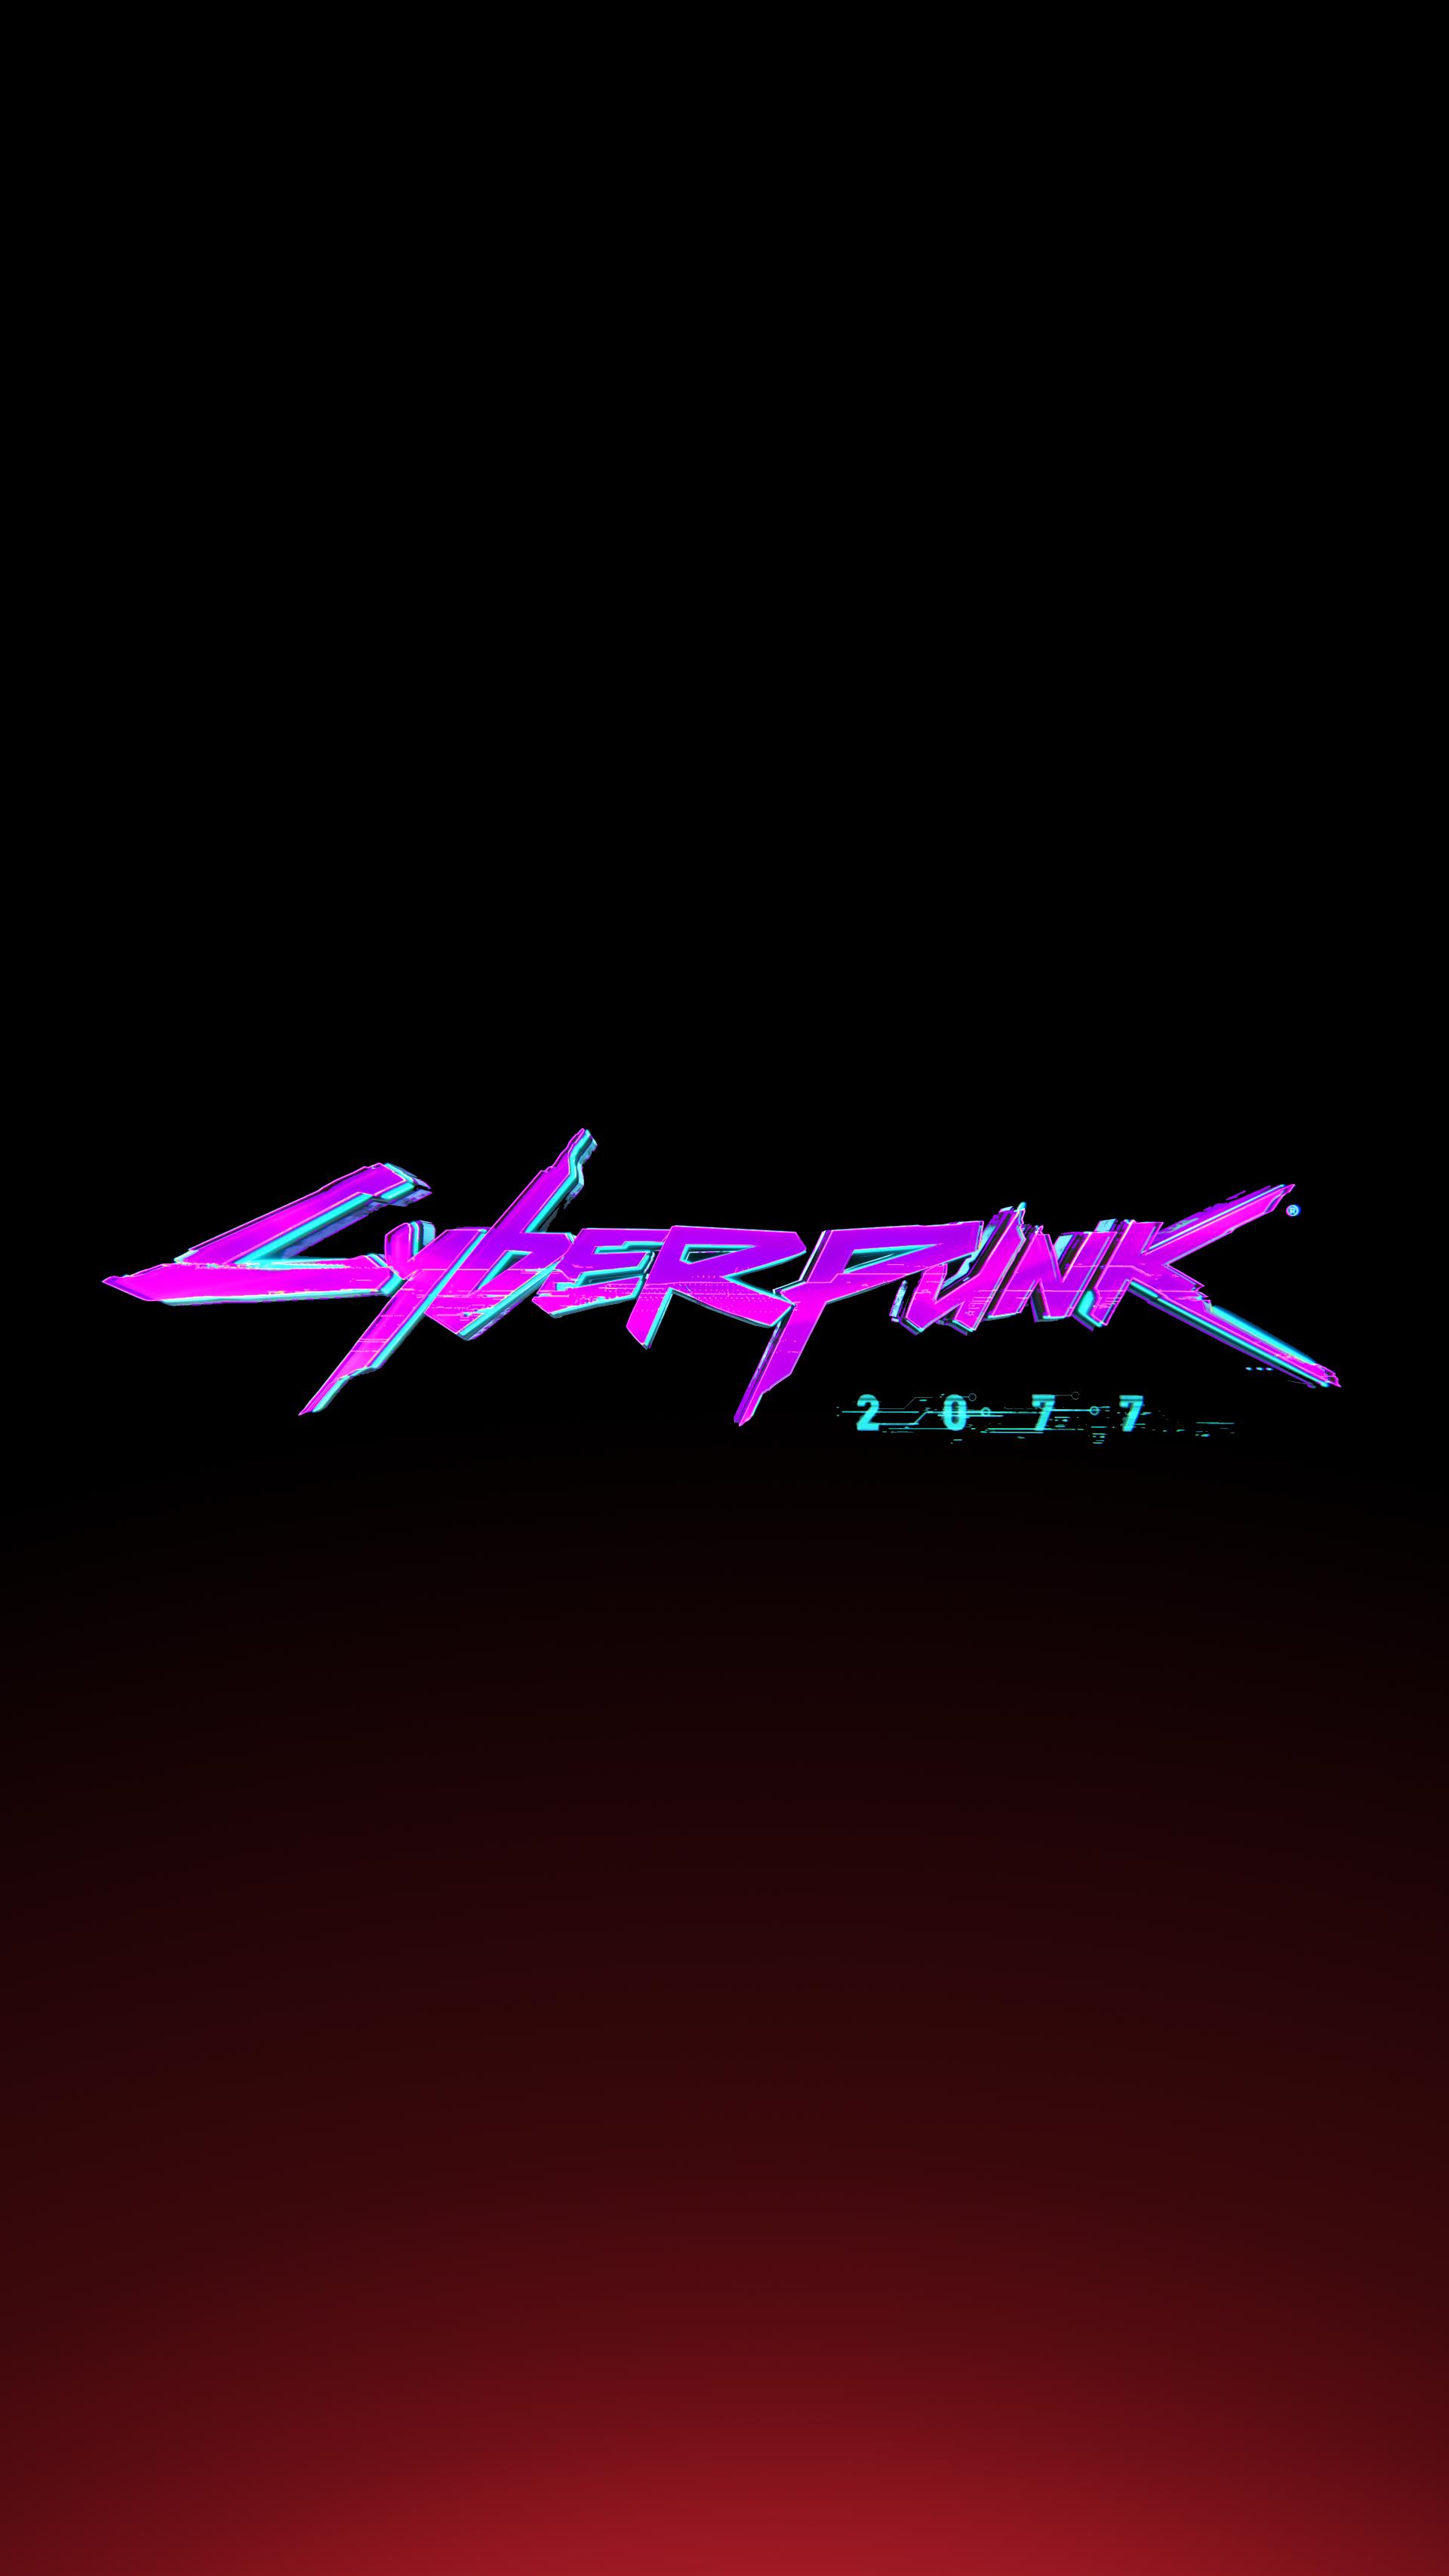 Cyberpunk 2077 Phone Wallpaper Reddit Djiwallpaper Co In 2020 Cyberpunk Cyberpunk 2077 Cyberpunk Aesthetic